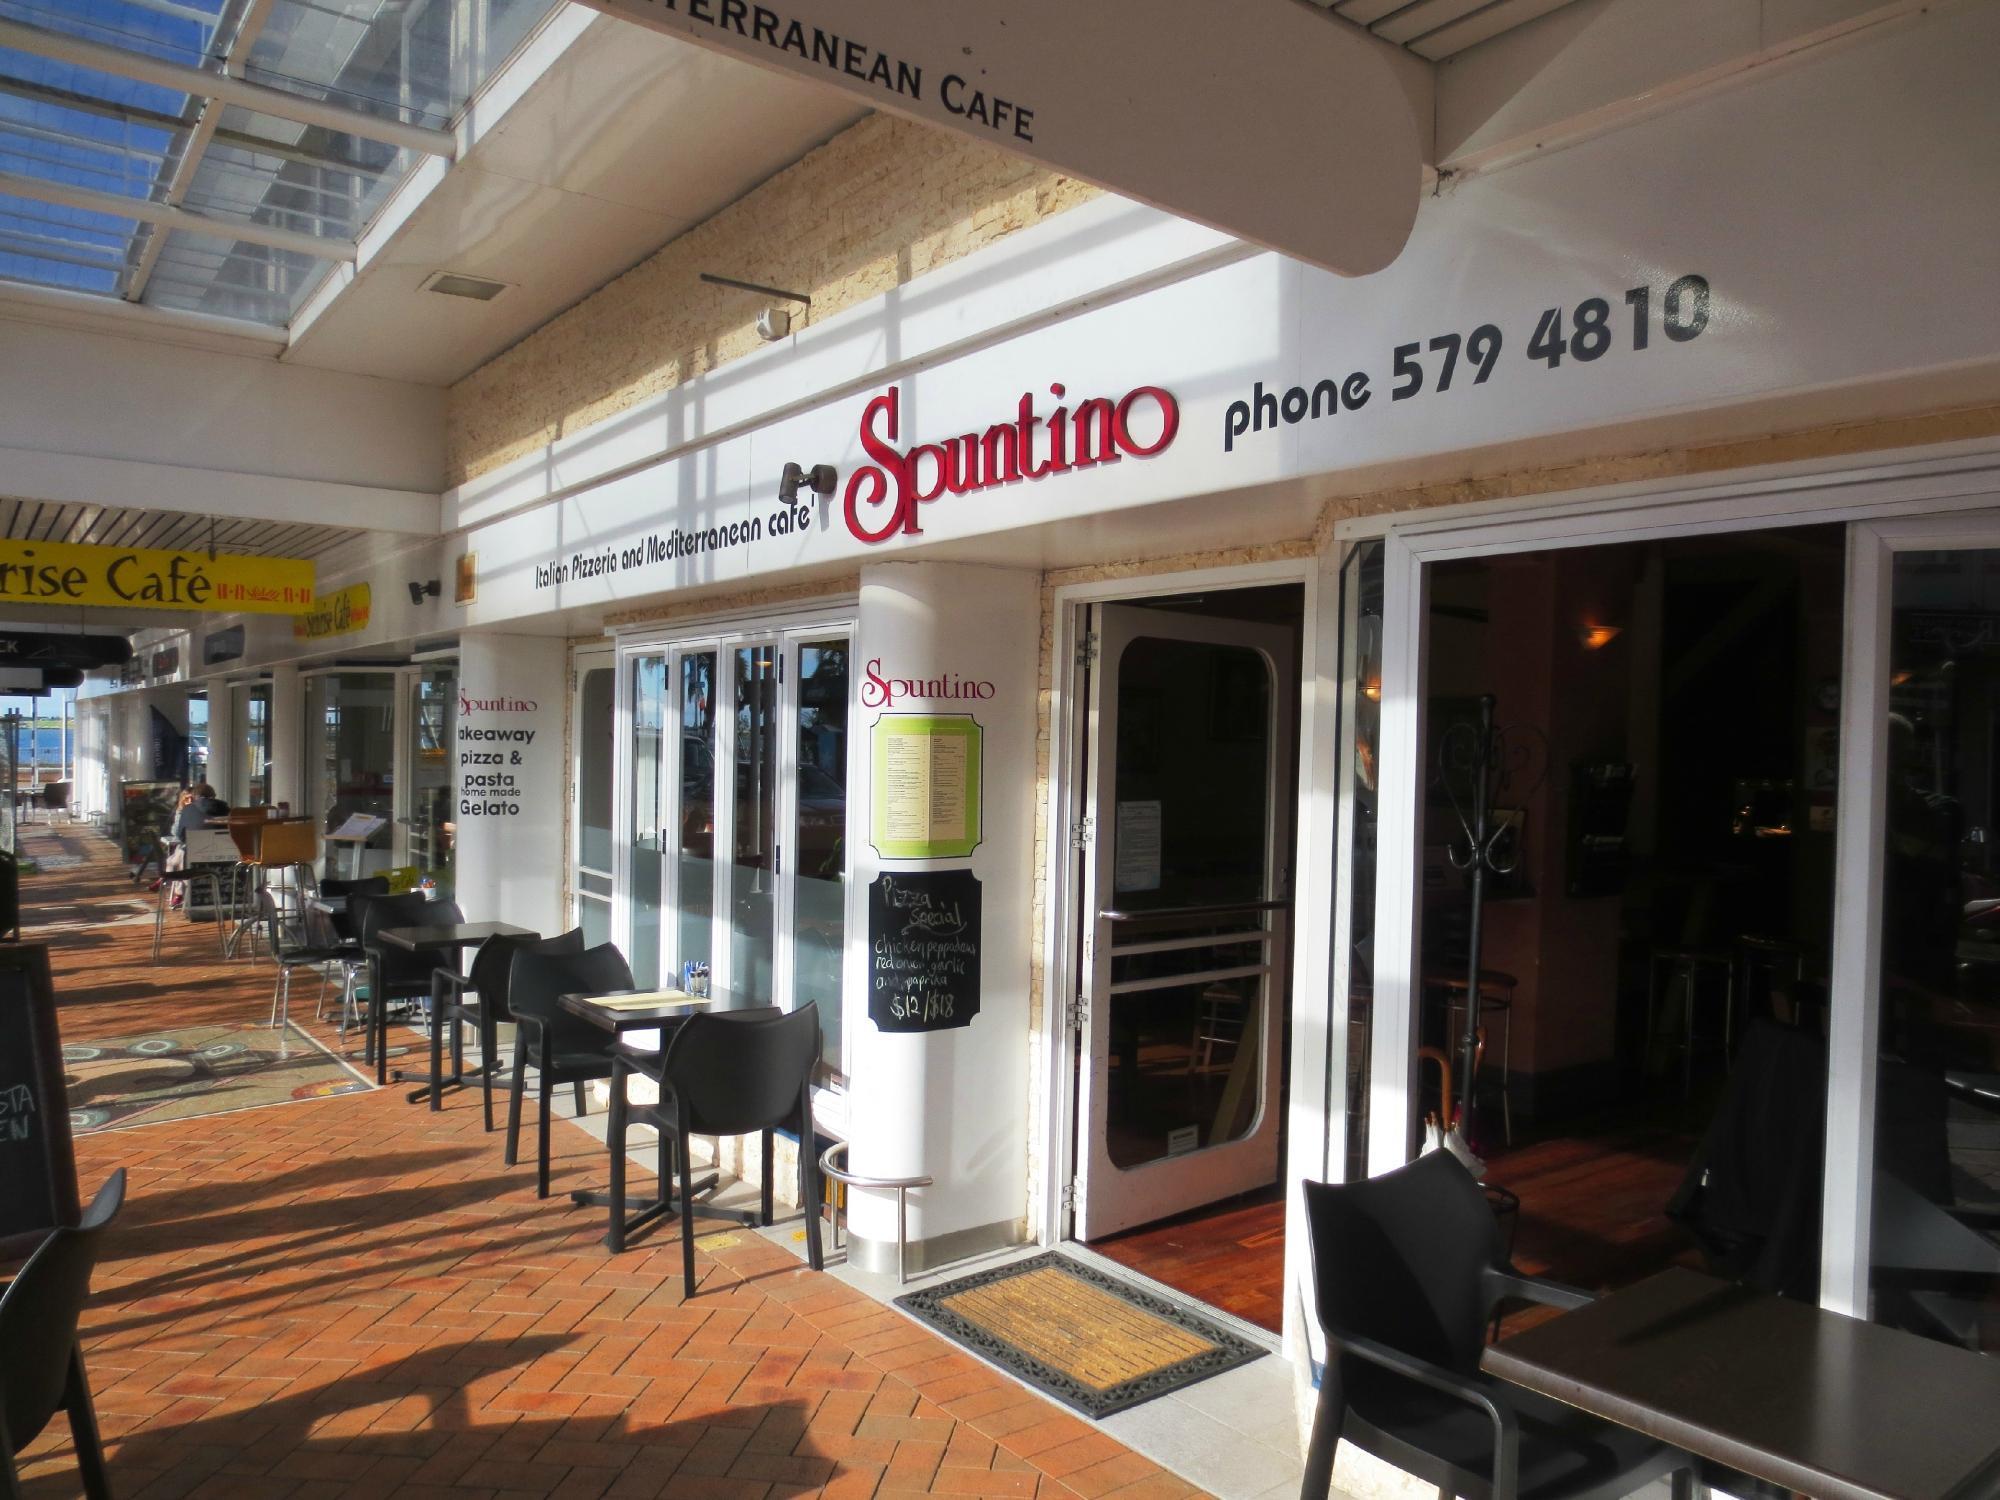 Sputino Italian Restaurant